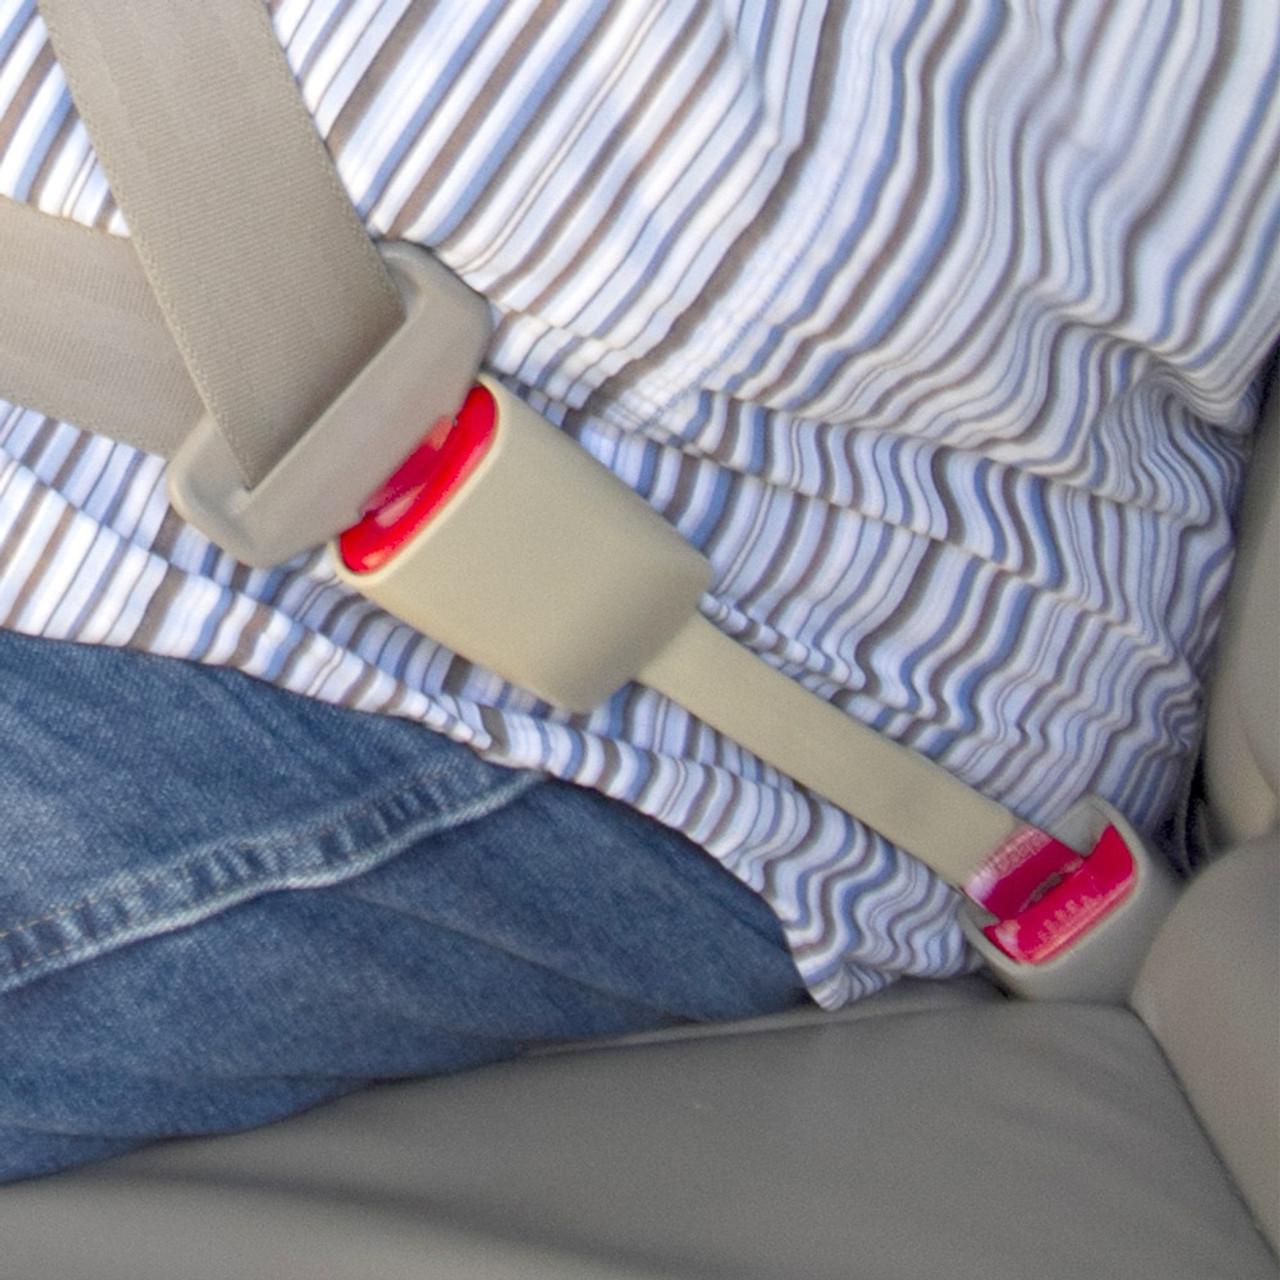 E4 Safe Seat Belt Extender for 2012 Jeep Wrangler Front Seats